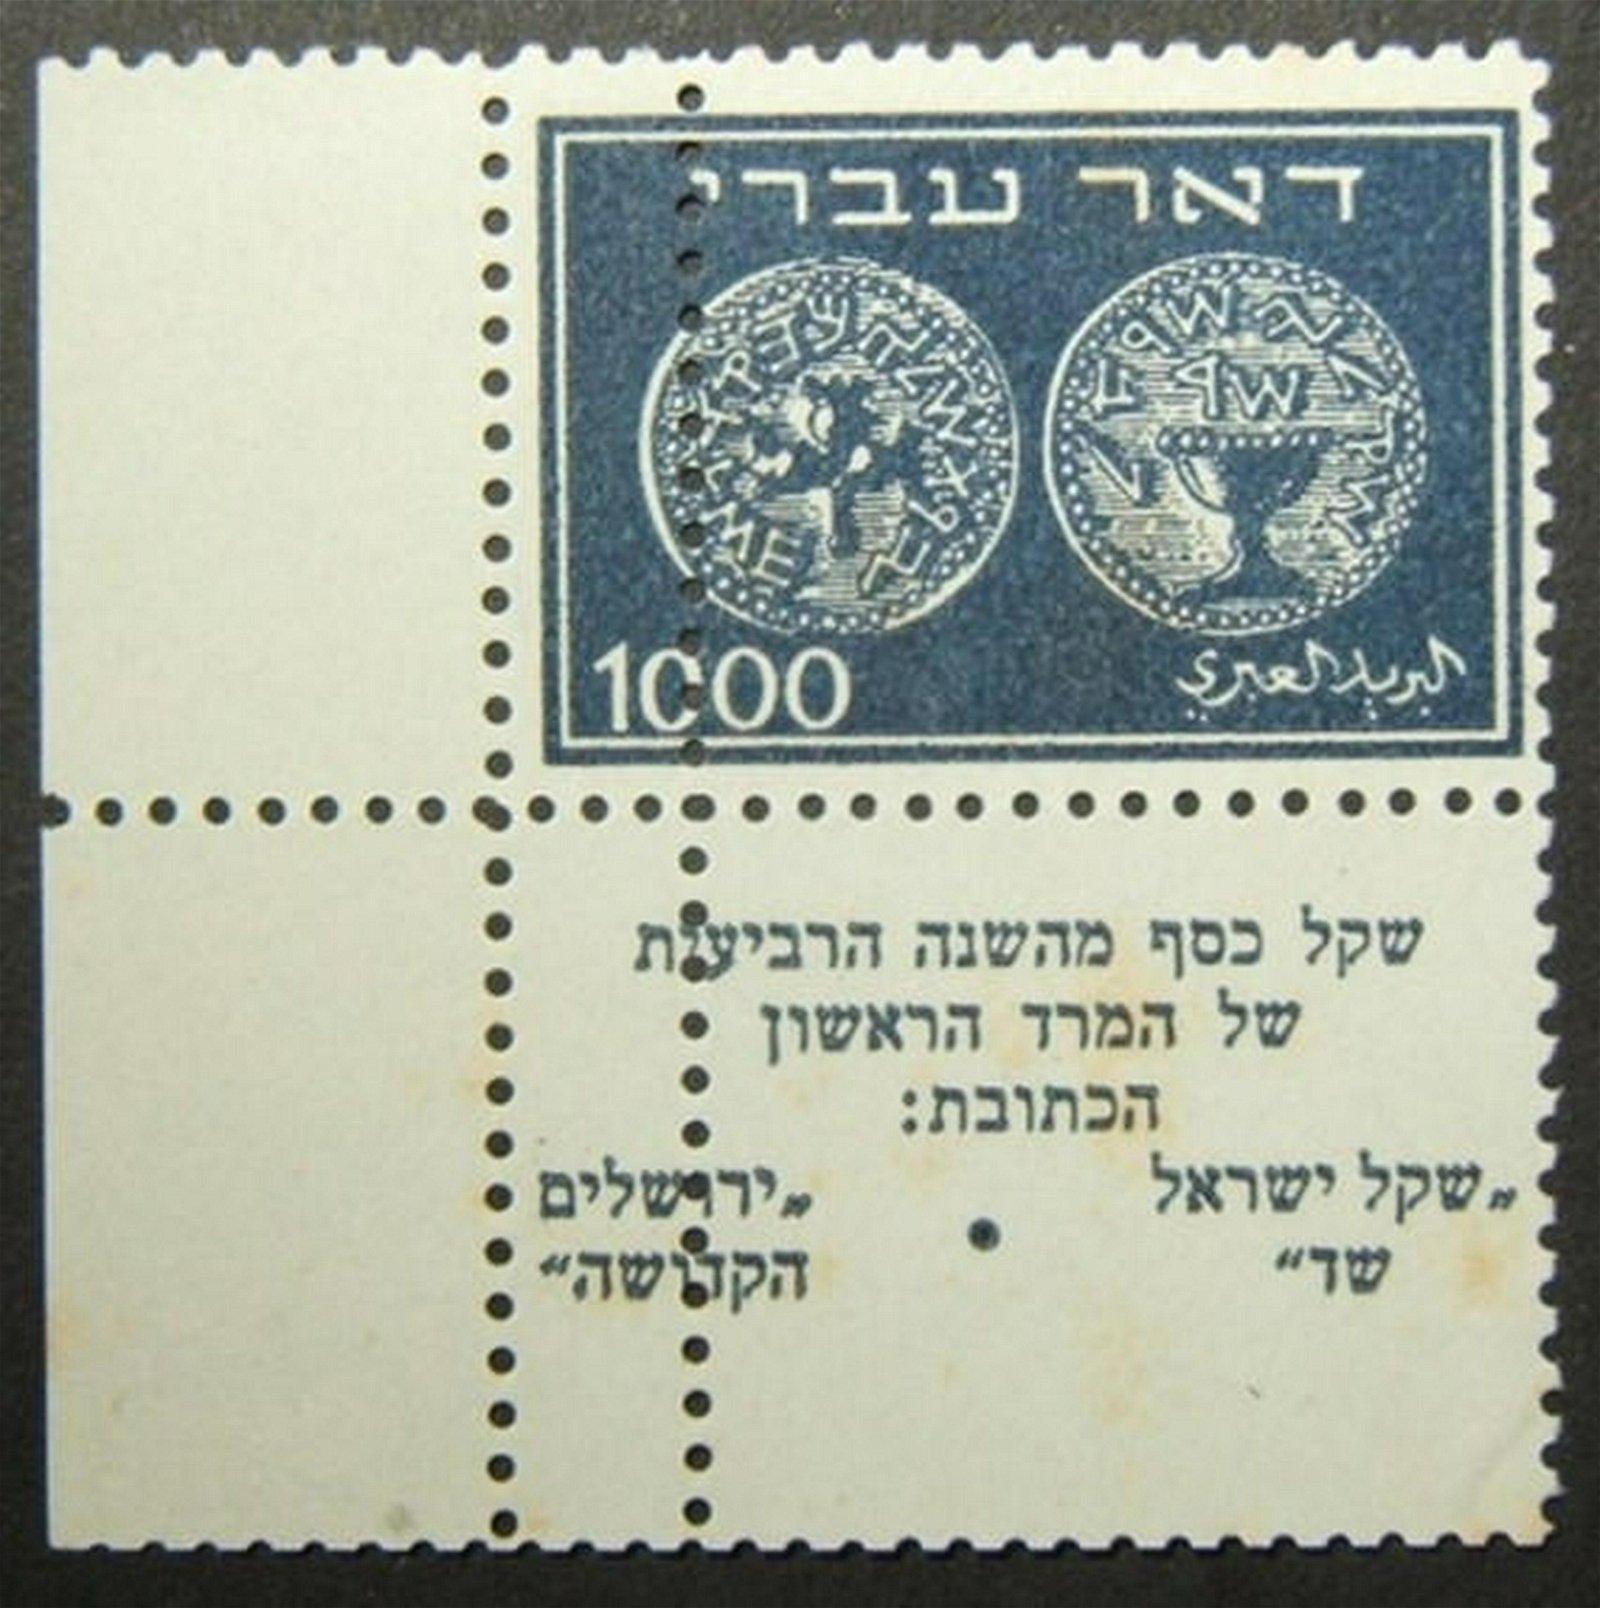 Doar Ivri 1000 mil tabbed 10:10 perforation stamp